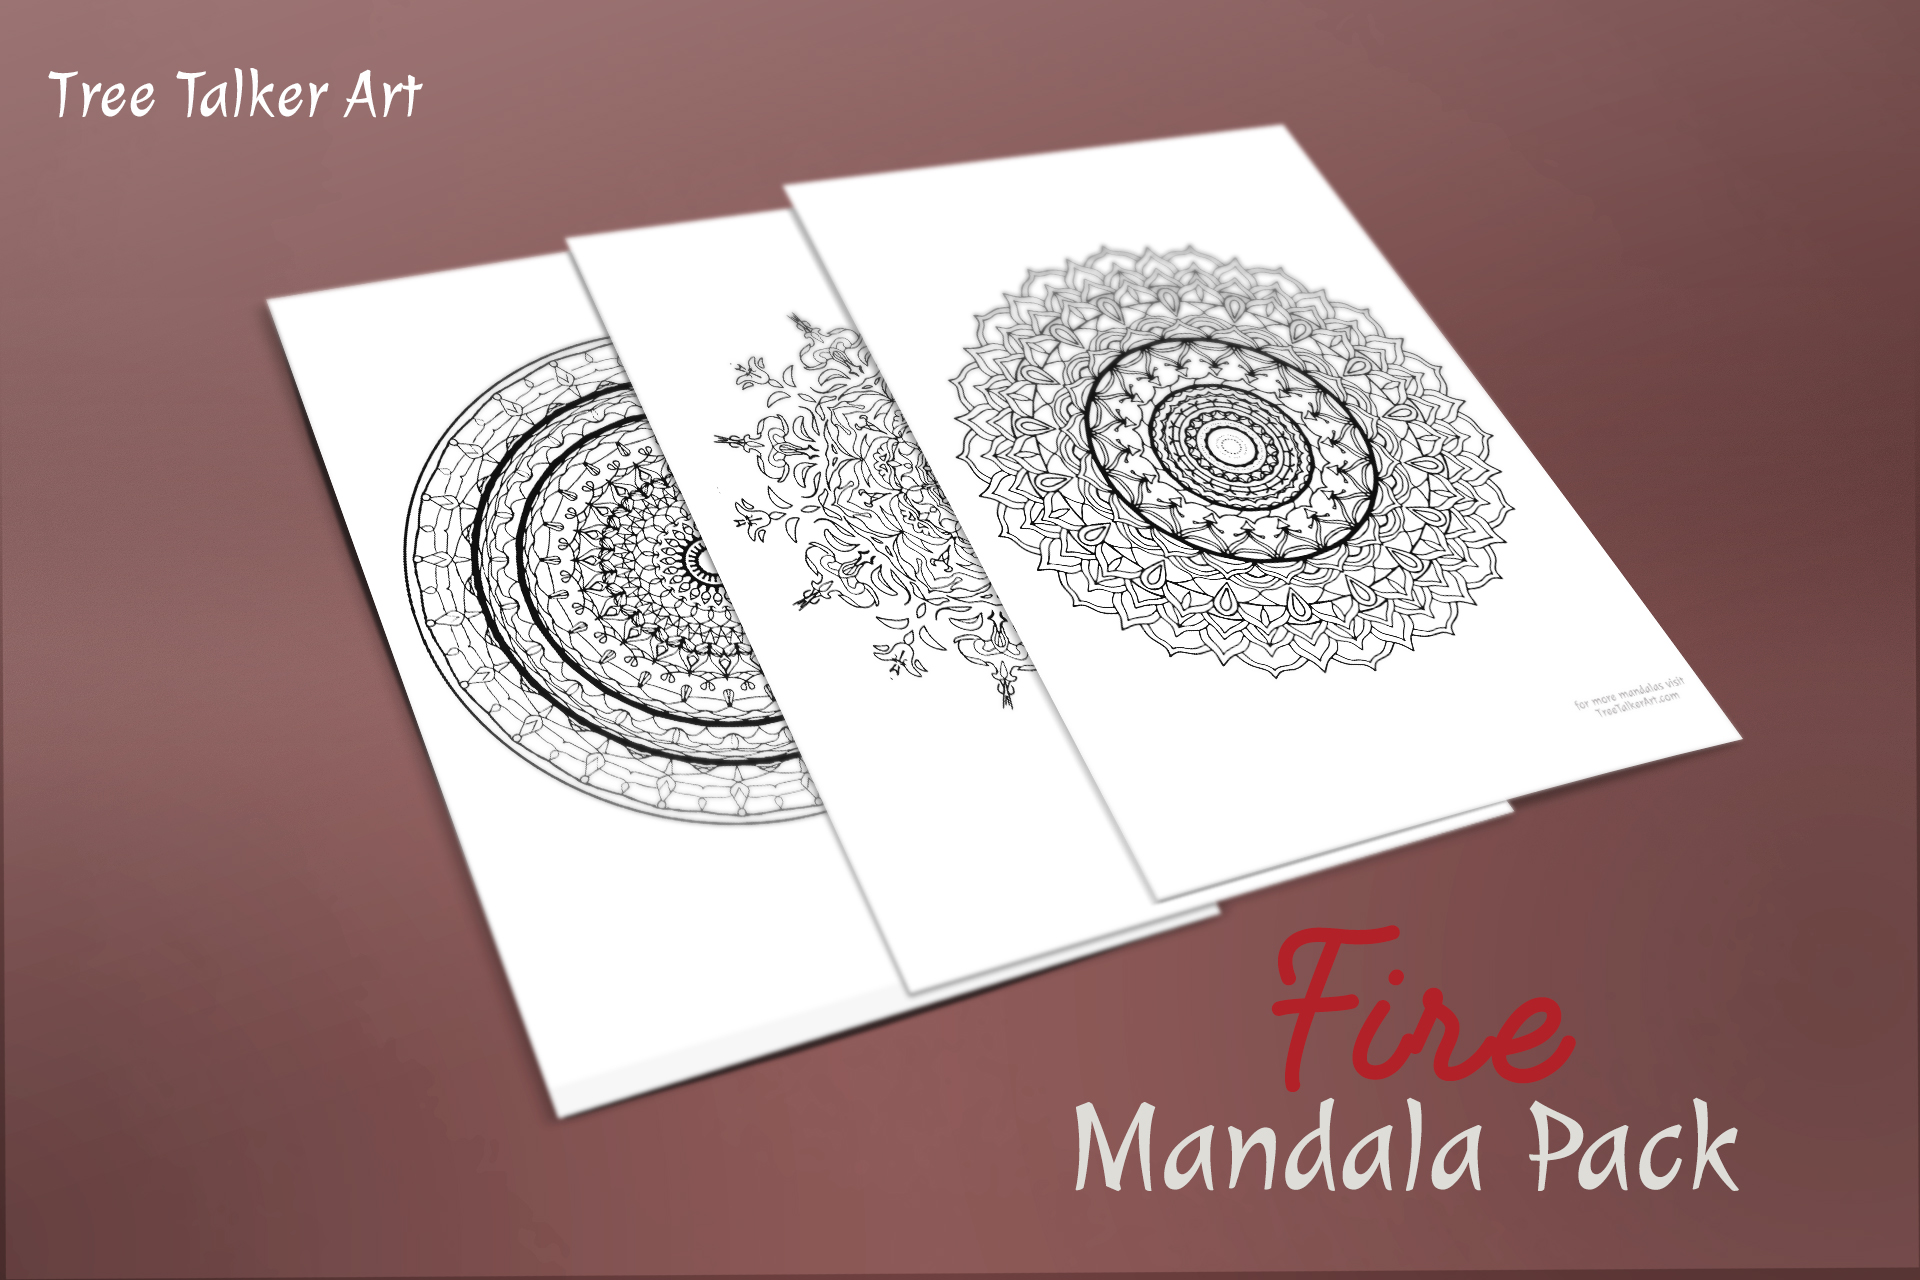 Fire Downloadable Mandala Meditation Pack | Tree Talker Art